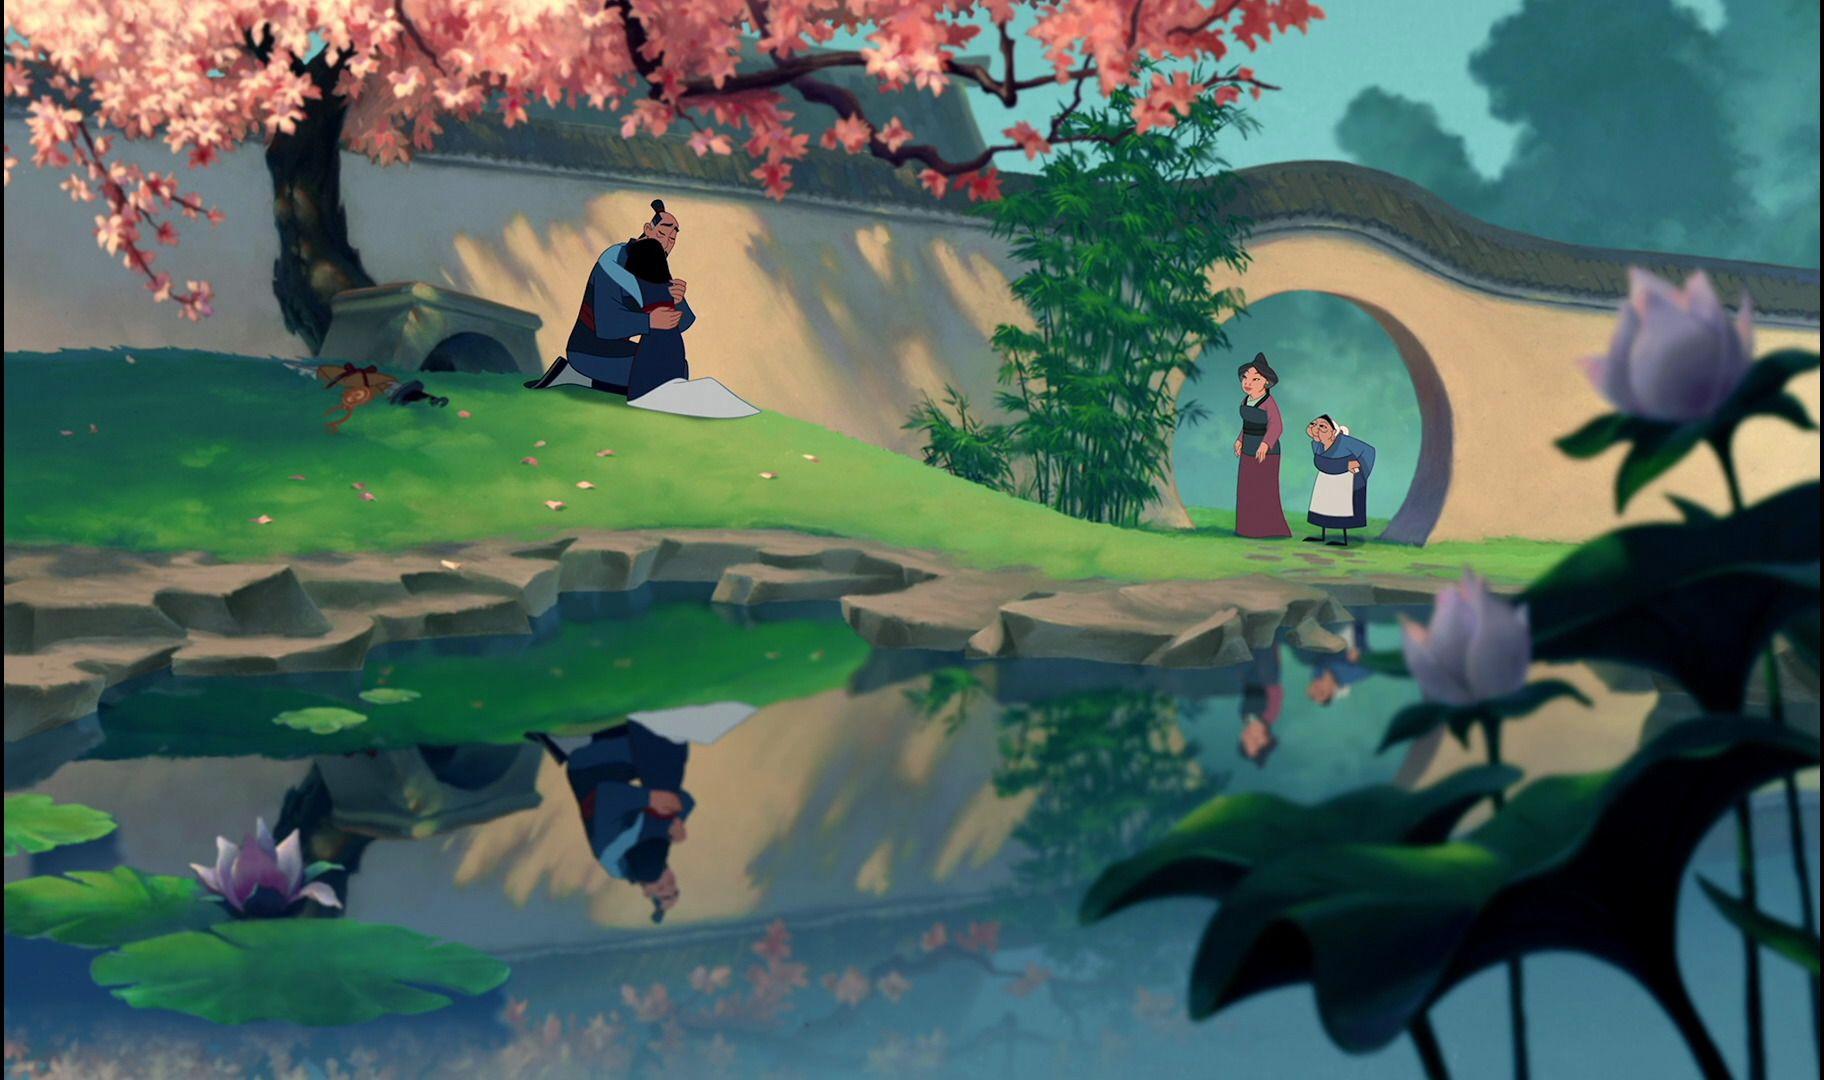 Mulan landscape art #disneyart #landscapeart